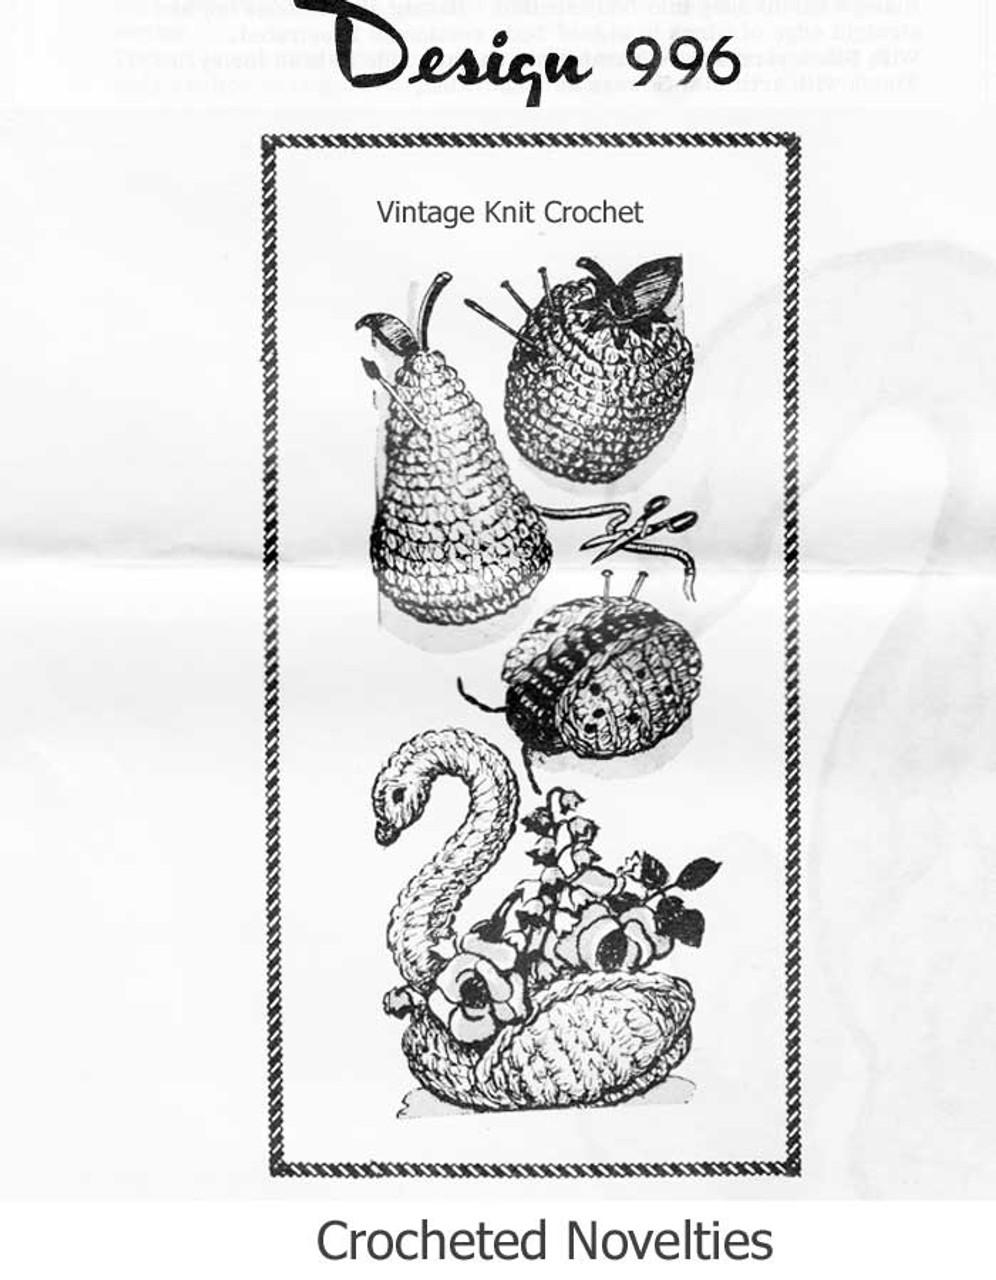 Easy Crochet Pincushions Pattern, Apple, Pear, Ladybug Design 996